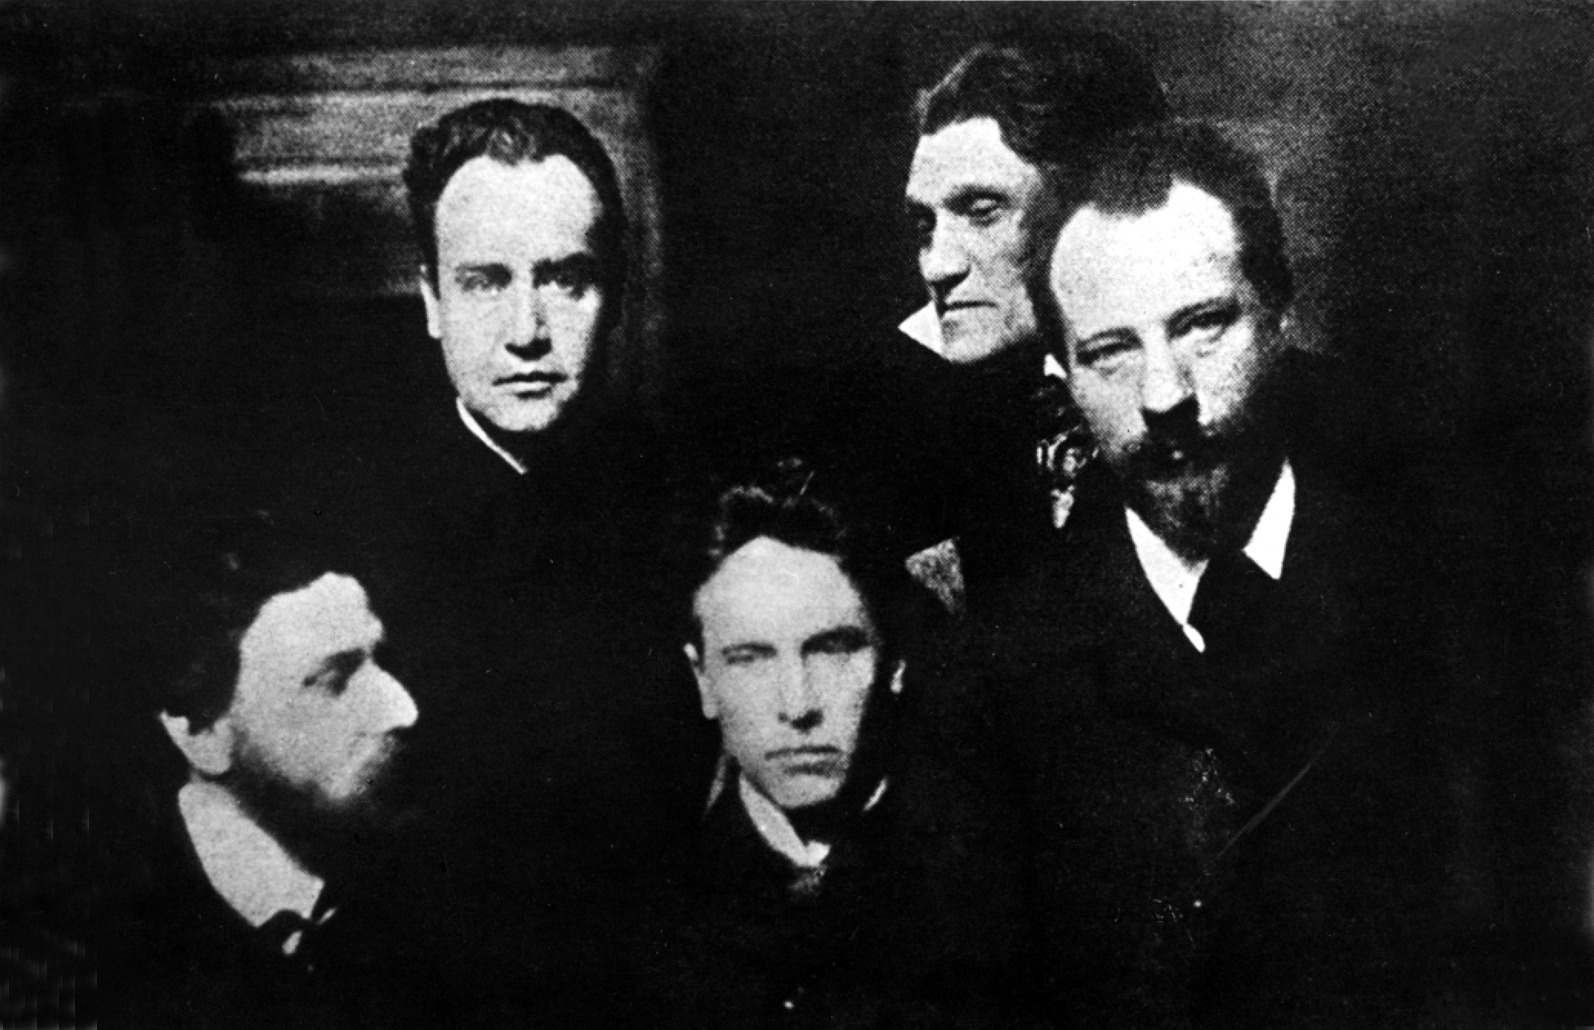 Die Münchner Kosmiker um 1900: Karl Wolfskehl, Alfred Schuler, Ludwig Klages, Stefan George und Albert Verwey